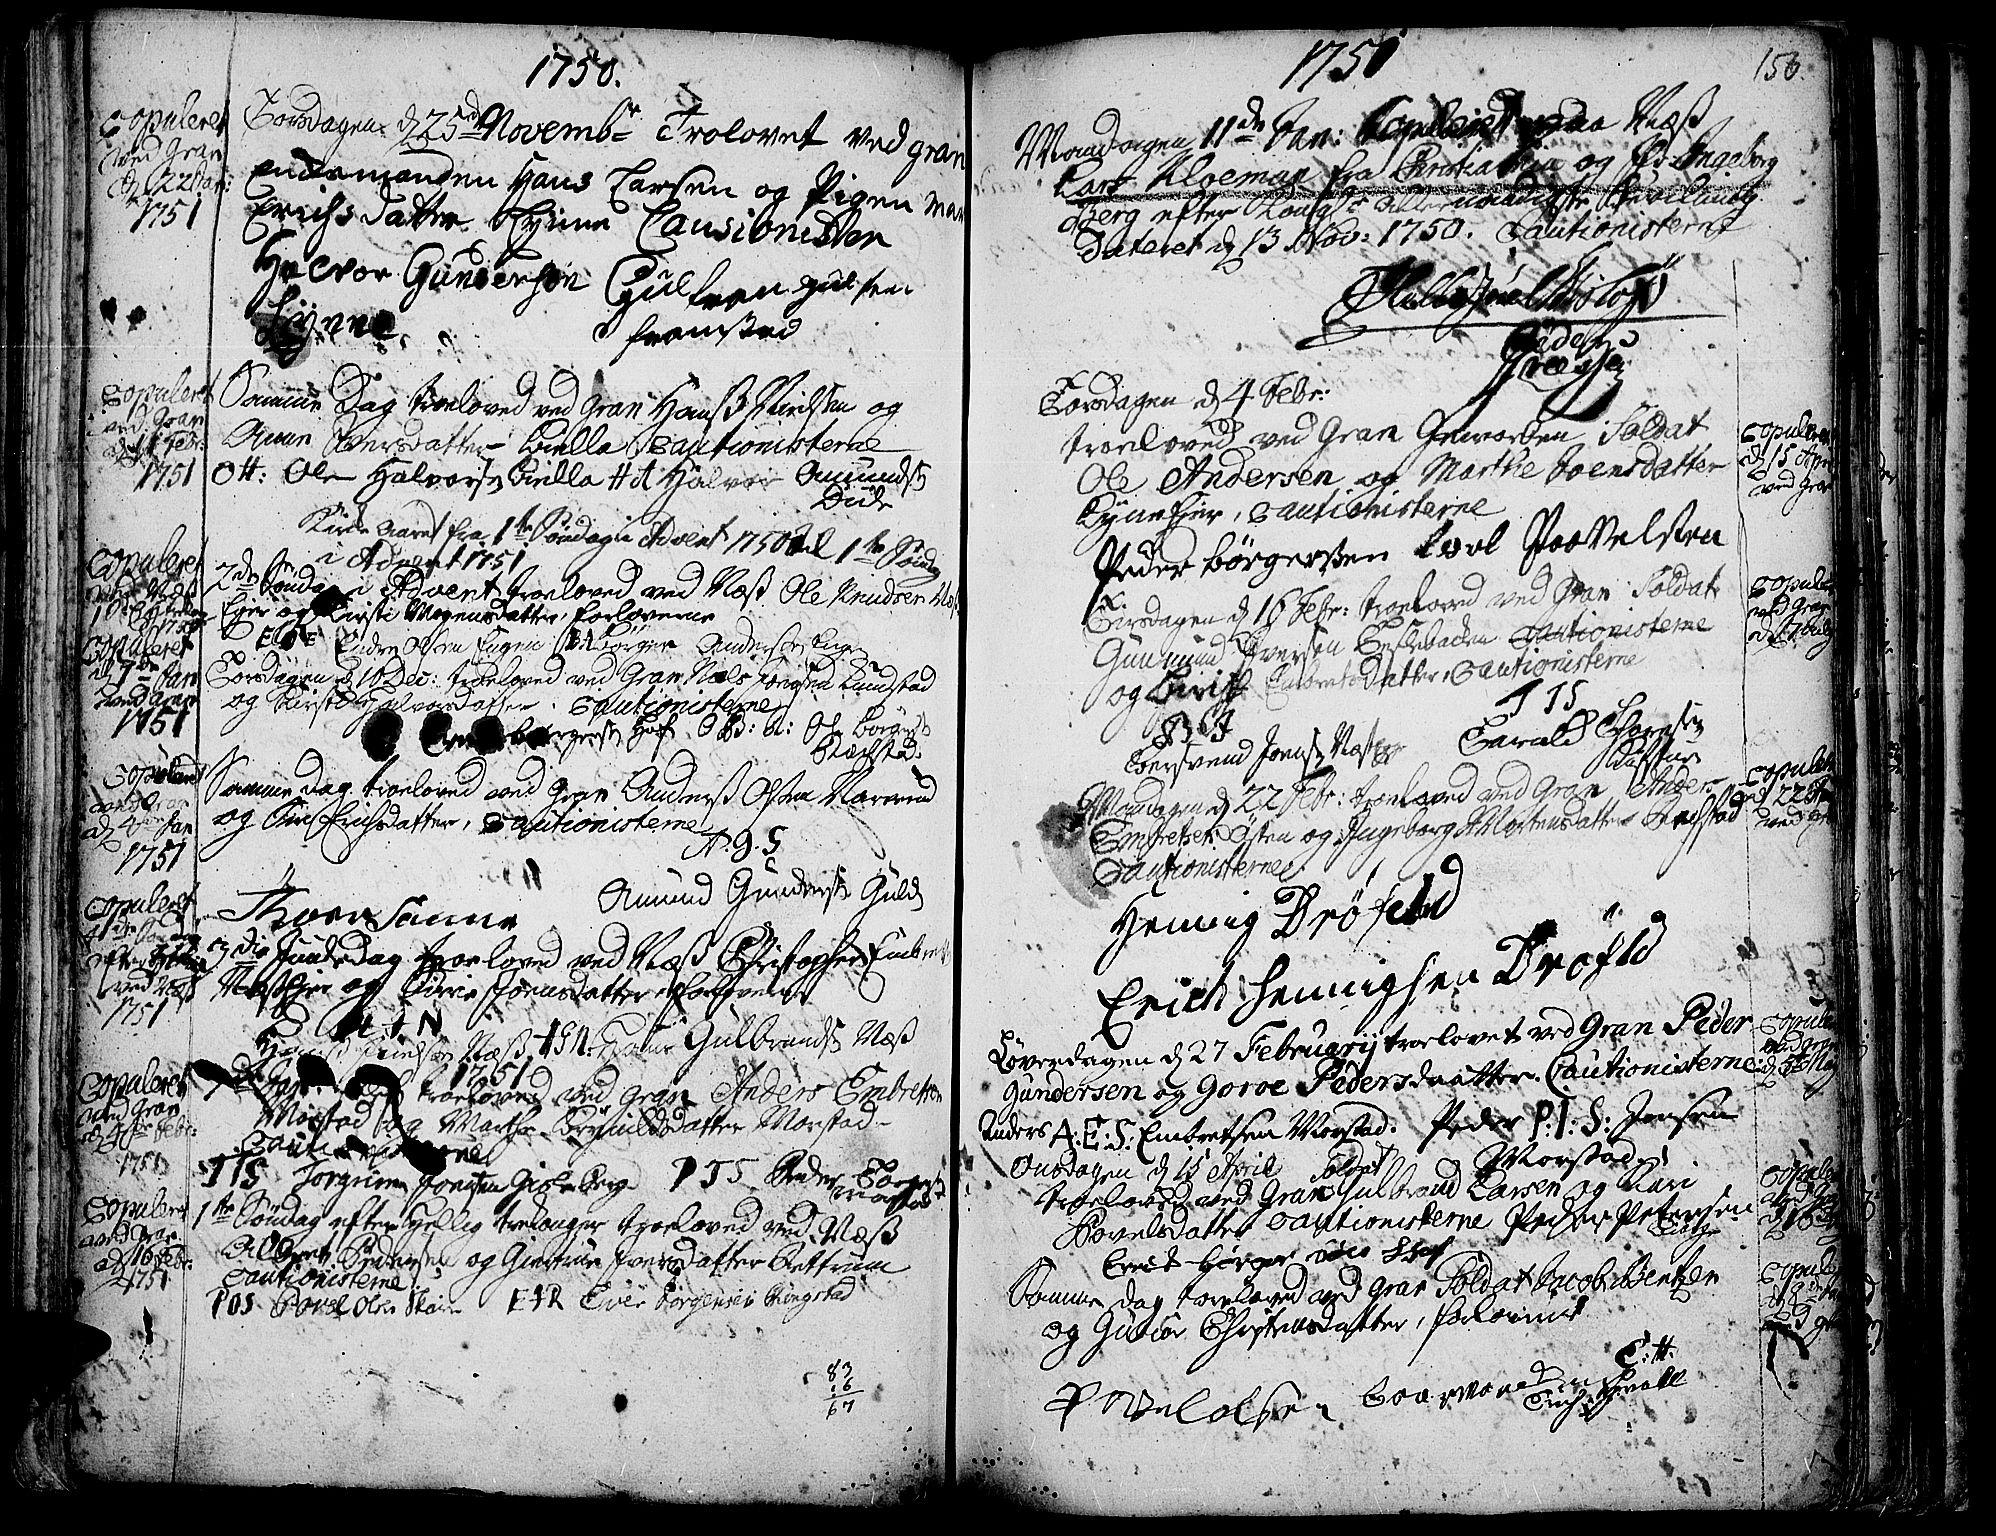 SAH, Gran prestekontor, Ministerialbok nr. 3, 1745-1758, s. 156